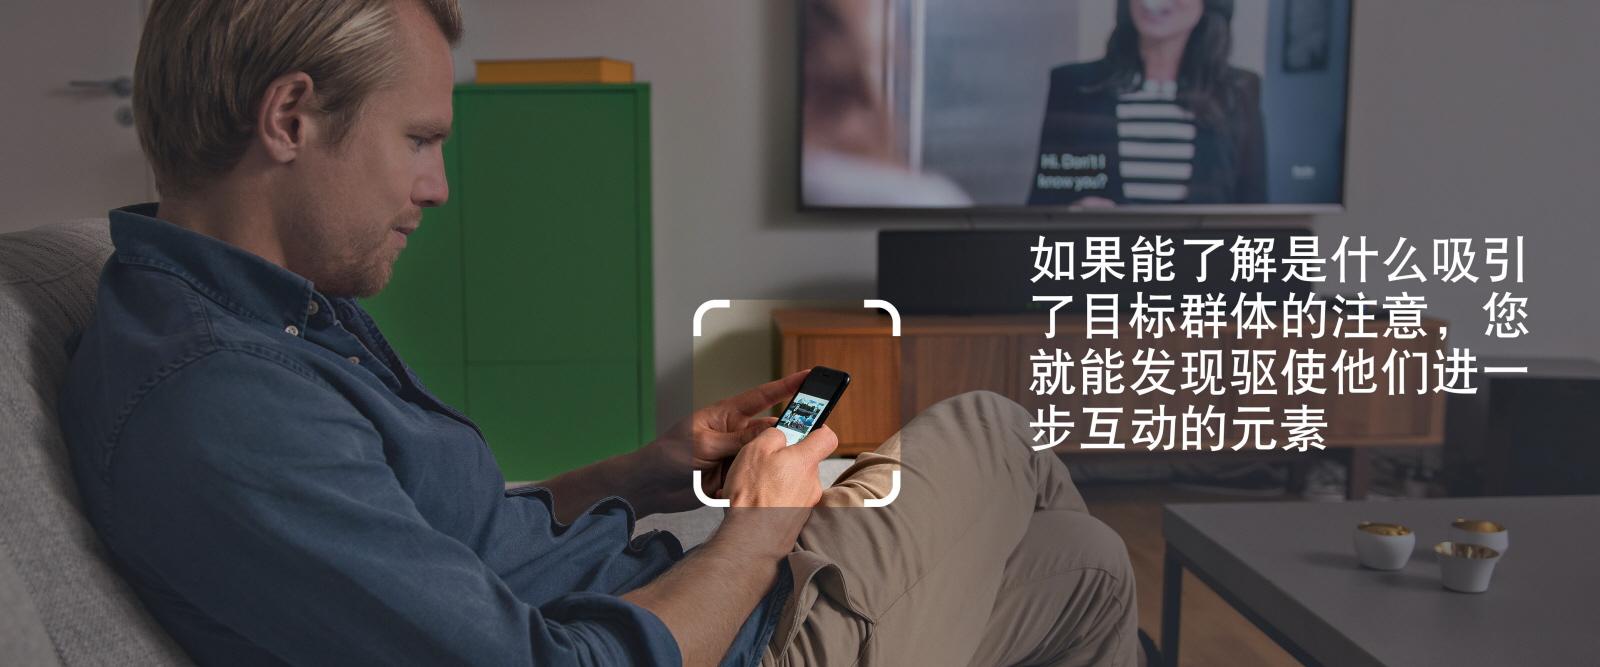 Tobii Pro Insight-Media Consumption -3